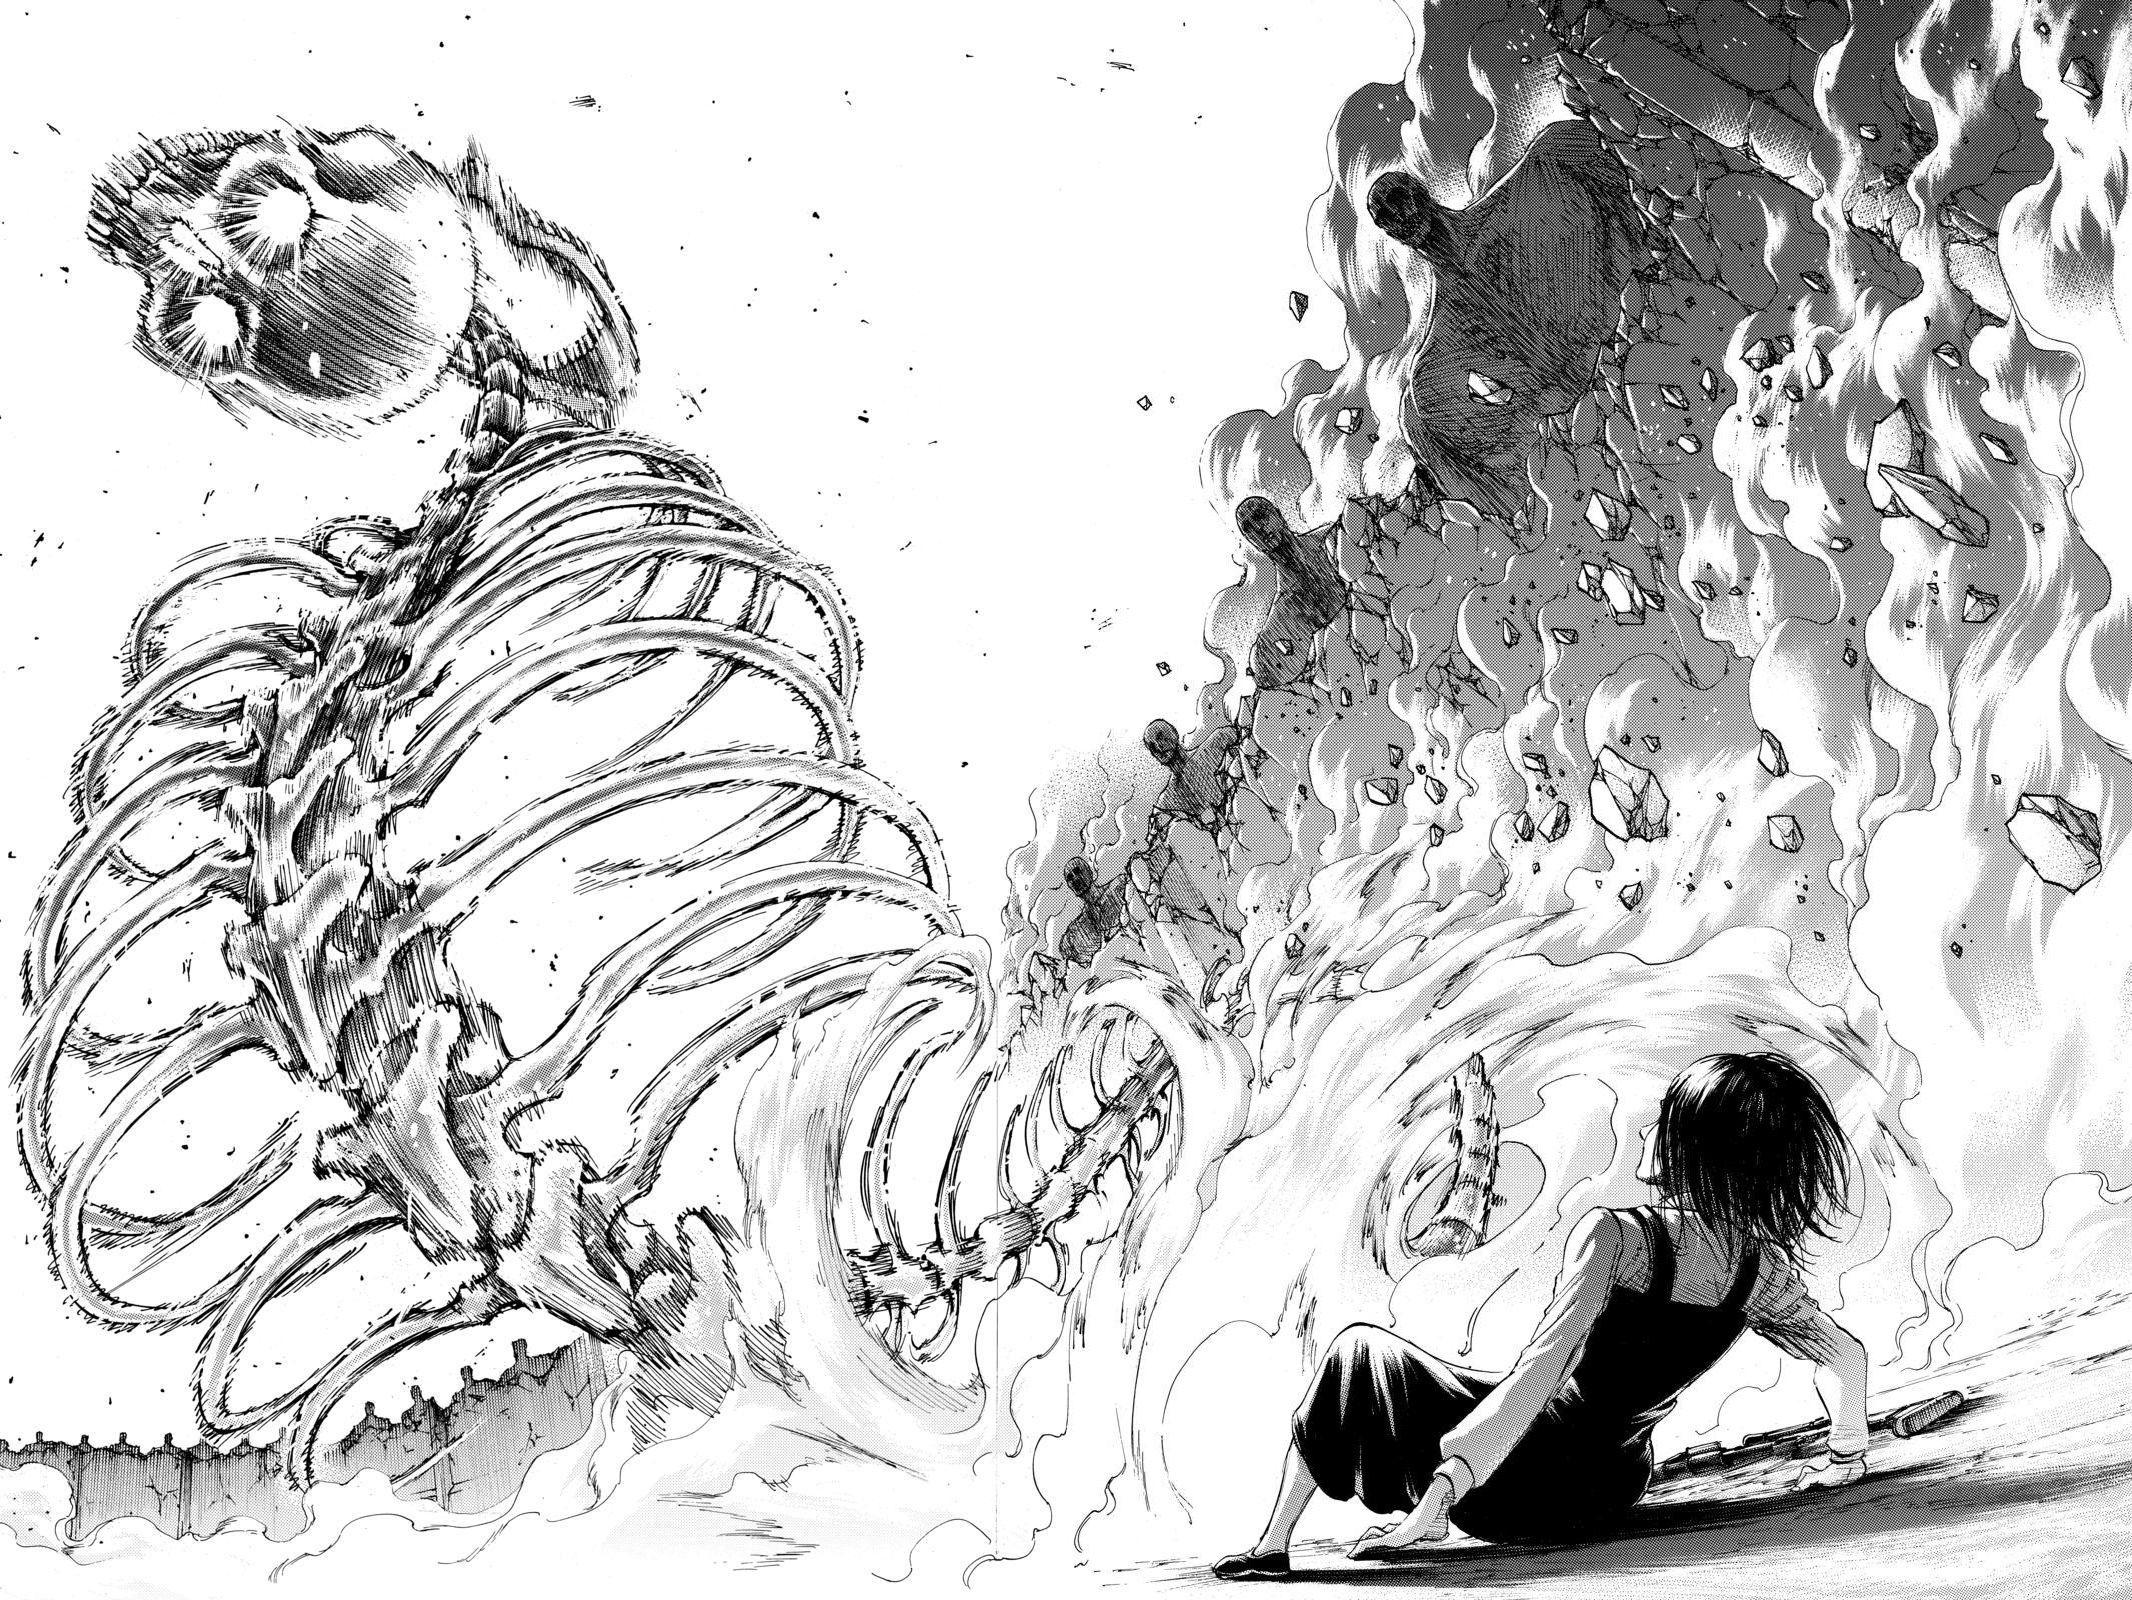 Shingeki No Kyojin Chapter 122 In 2020 Attack On Titan Series New Image Wallpaper Attack On Titan